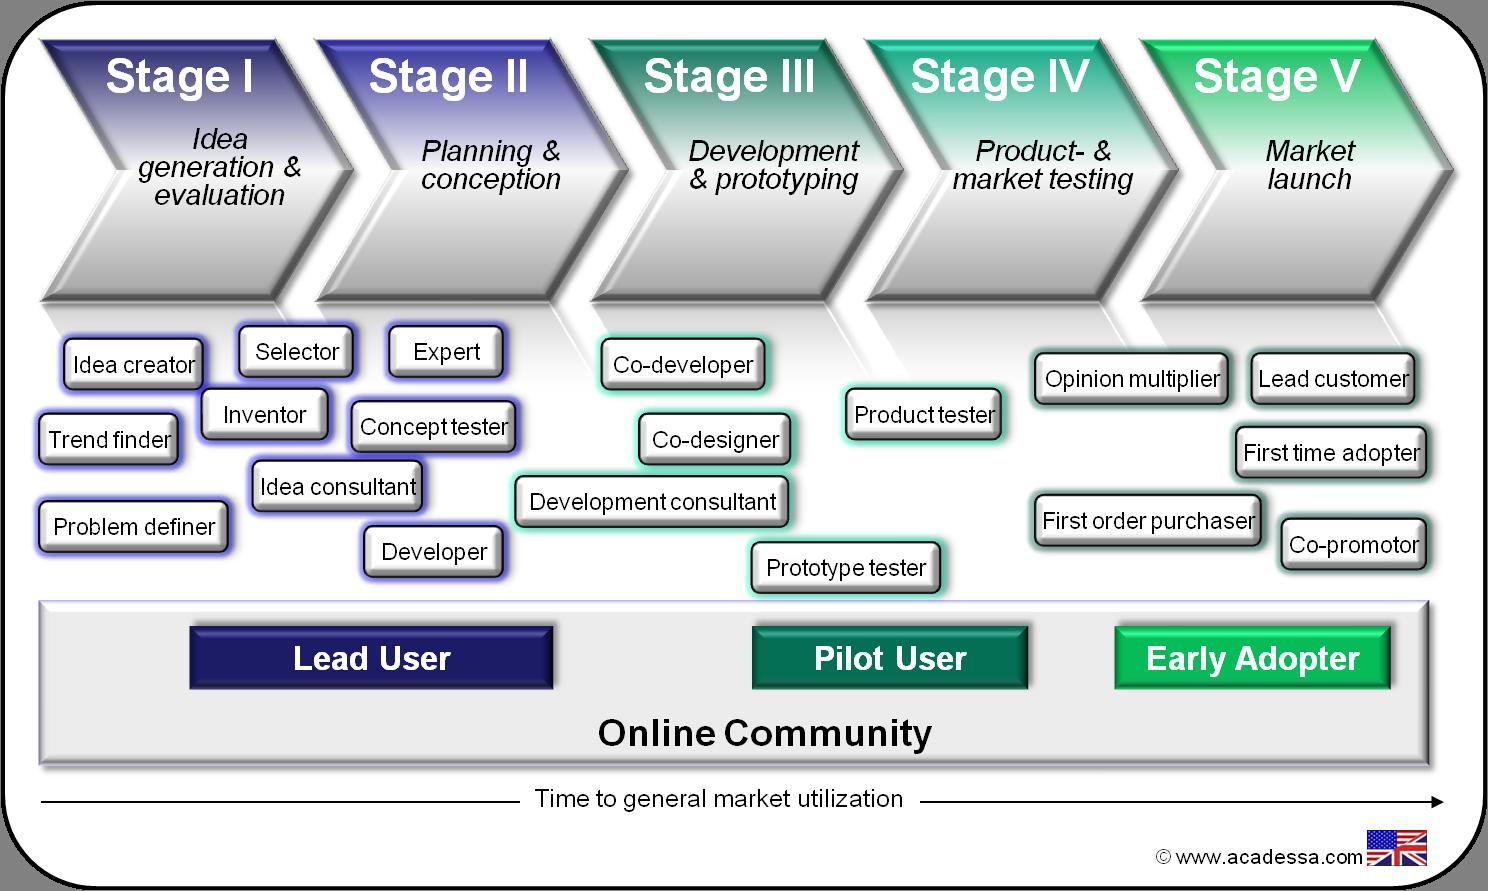 Acadessa | Customers' involvement into open innovation process ...